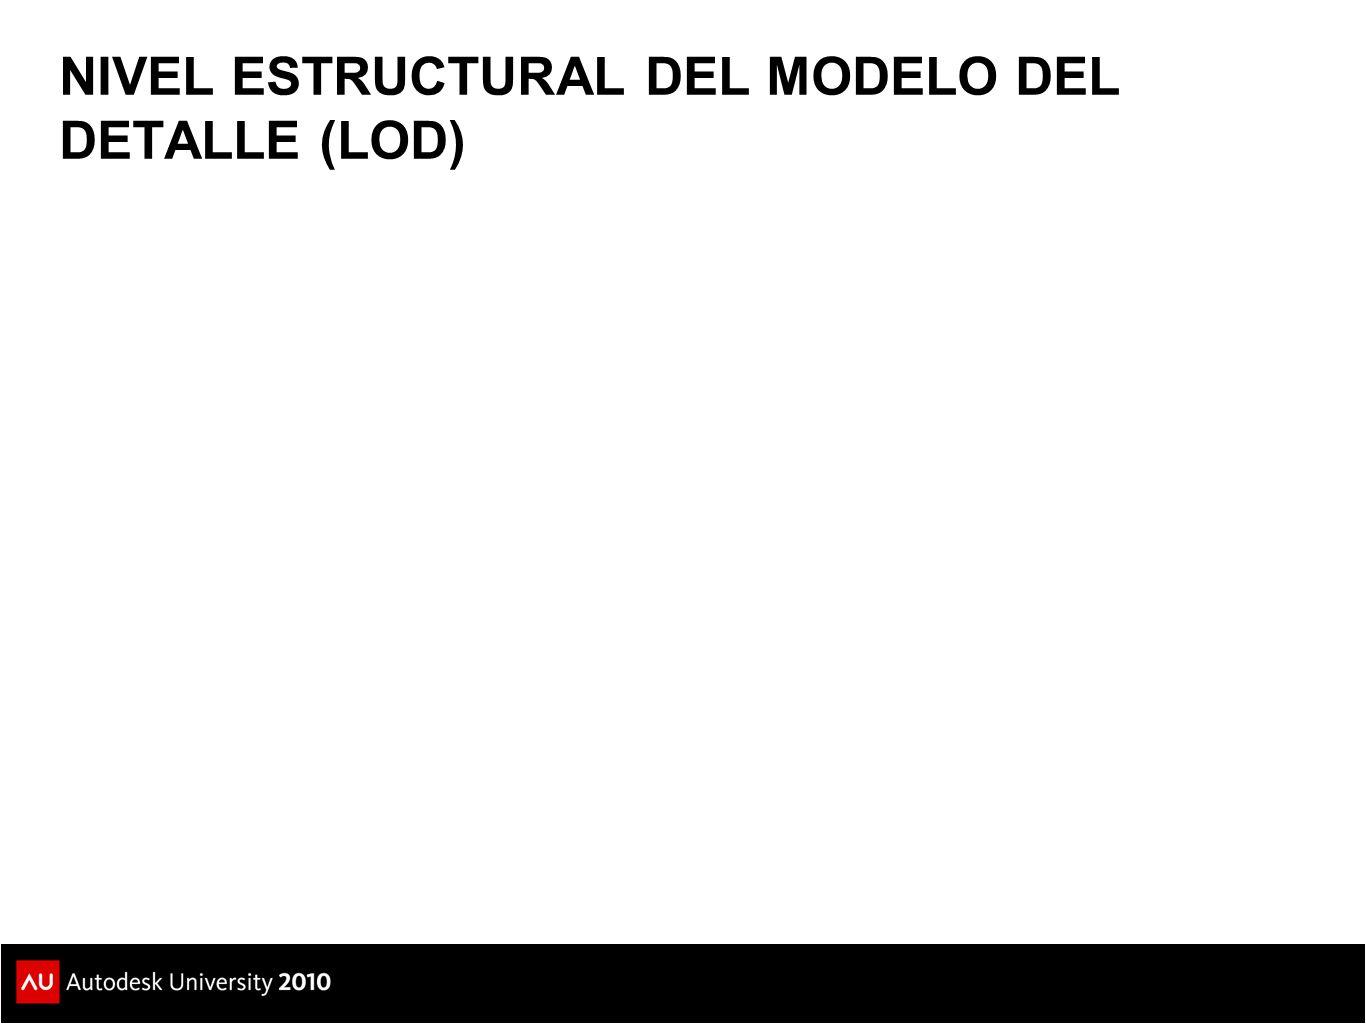 NIVEL ESTRUCTURAL DEL MODELO DEL DETALLE (LOD)